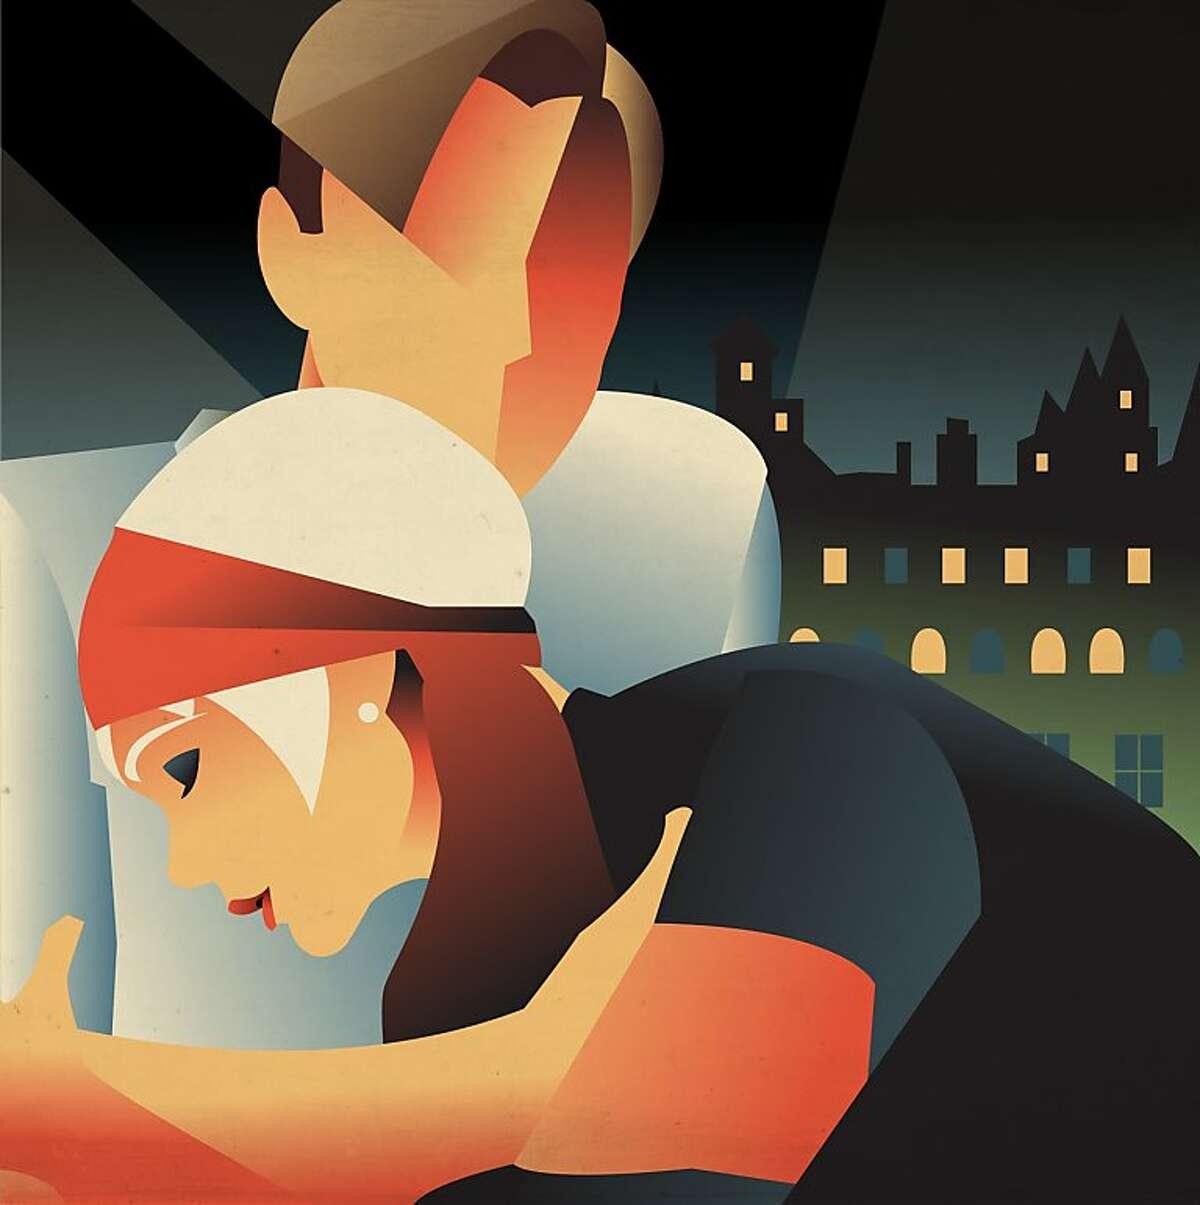 Illustration for gatsby10